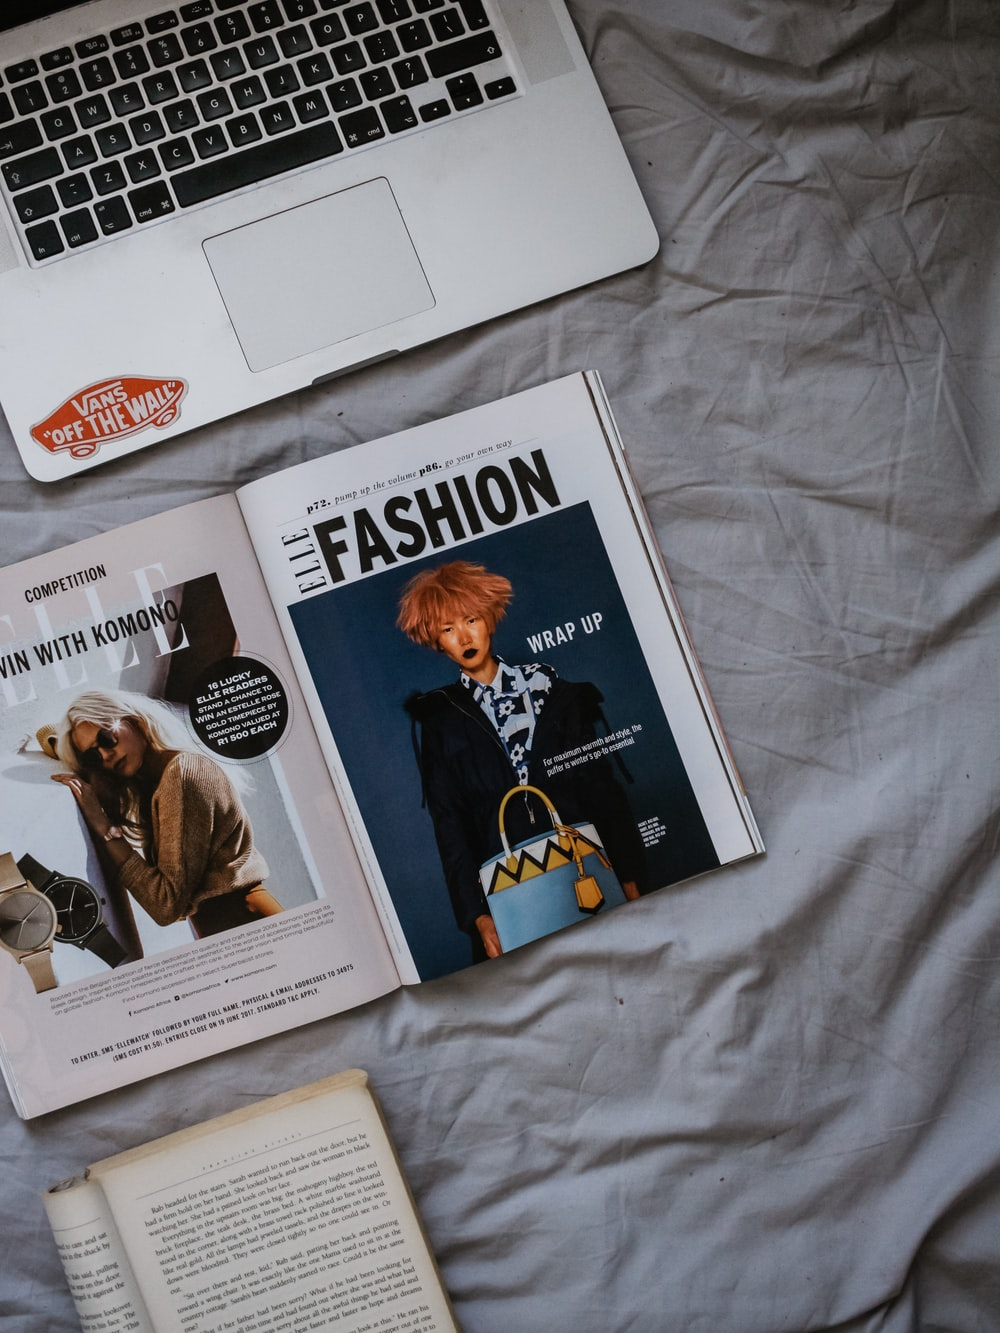 MacBook Pro beside magazine